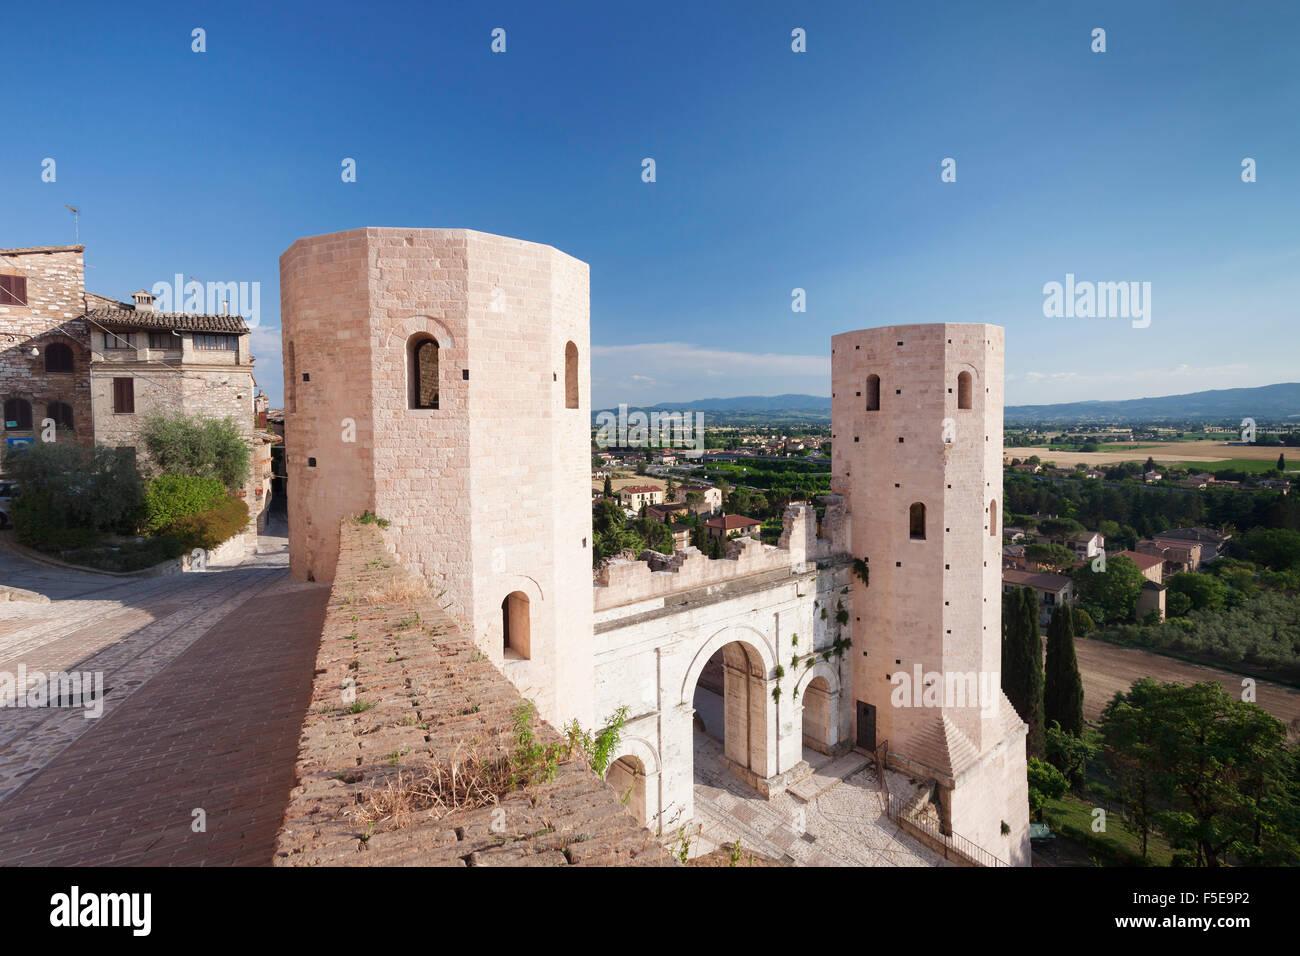 Porto Venere gate and Torri di Properzio Tower, Spello, Perugia District, Umbria, Italy, Europe - Stock Image